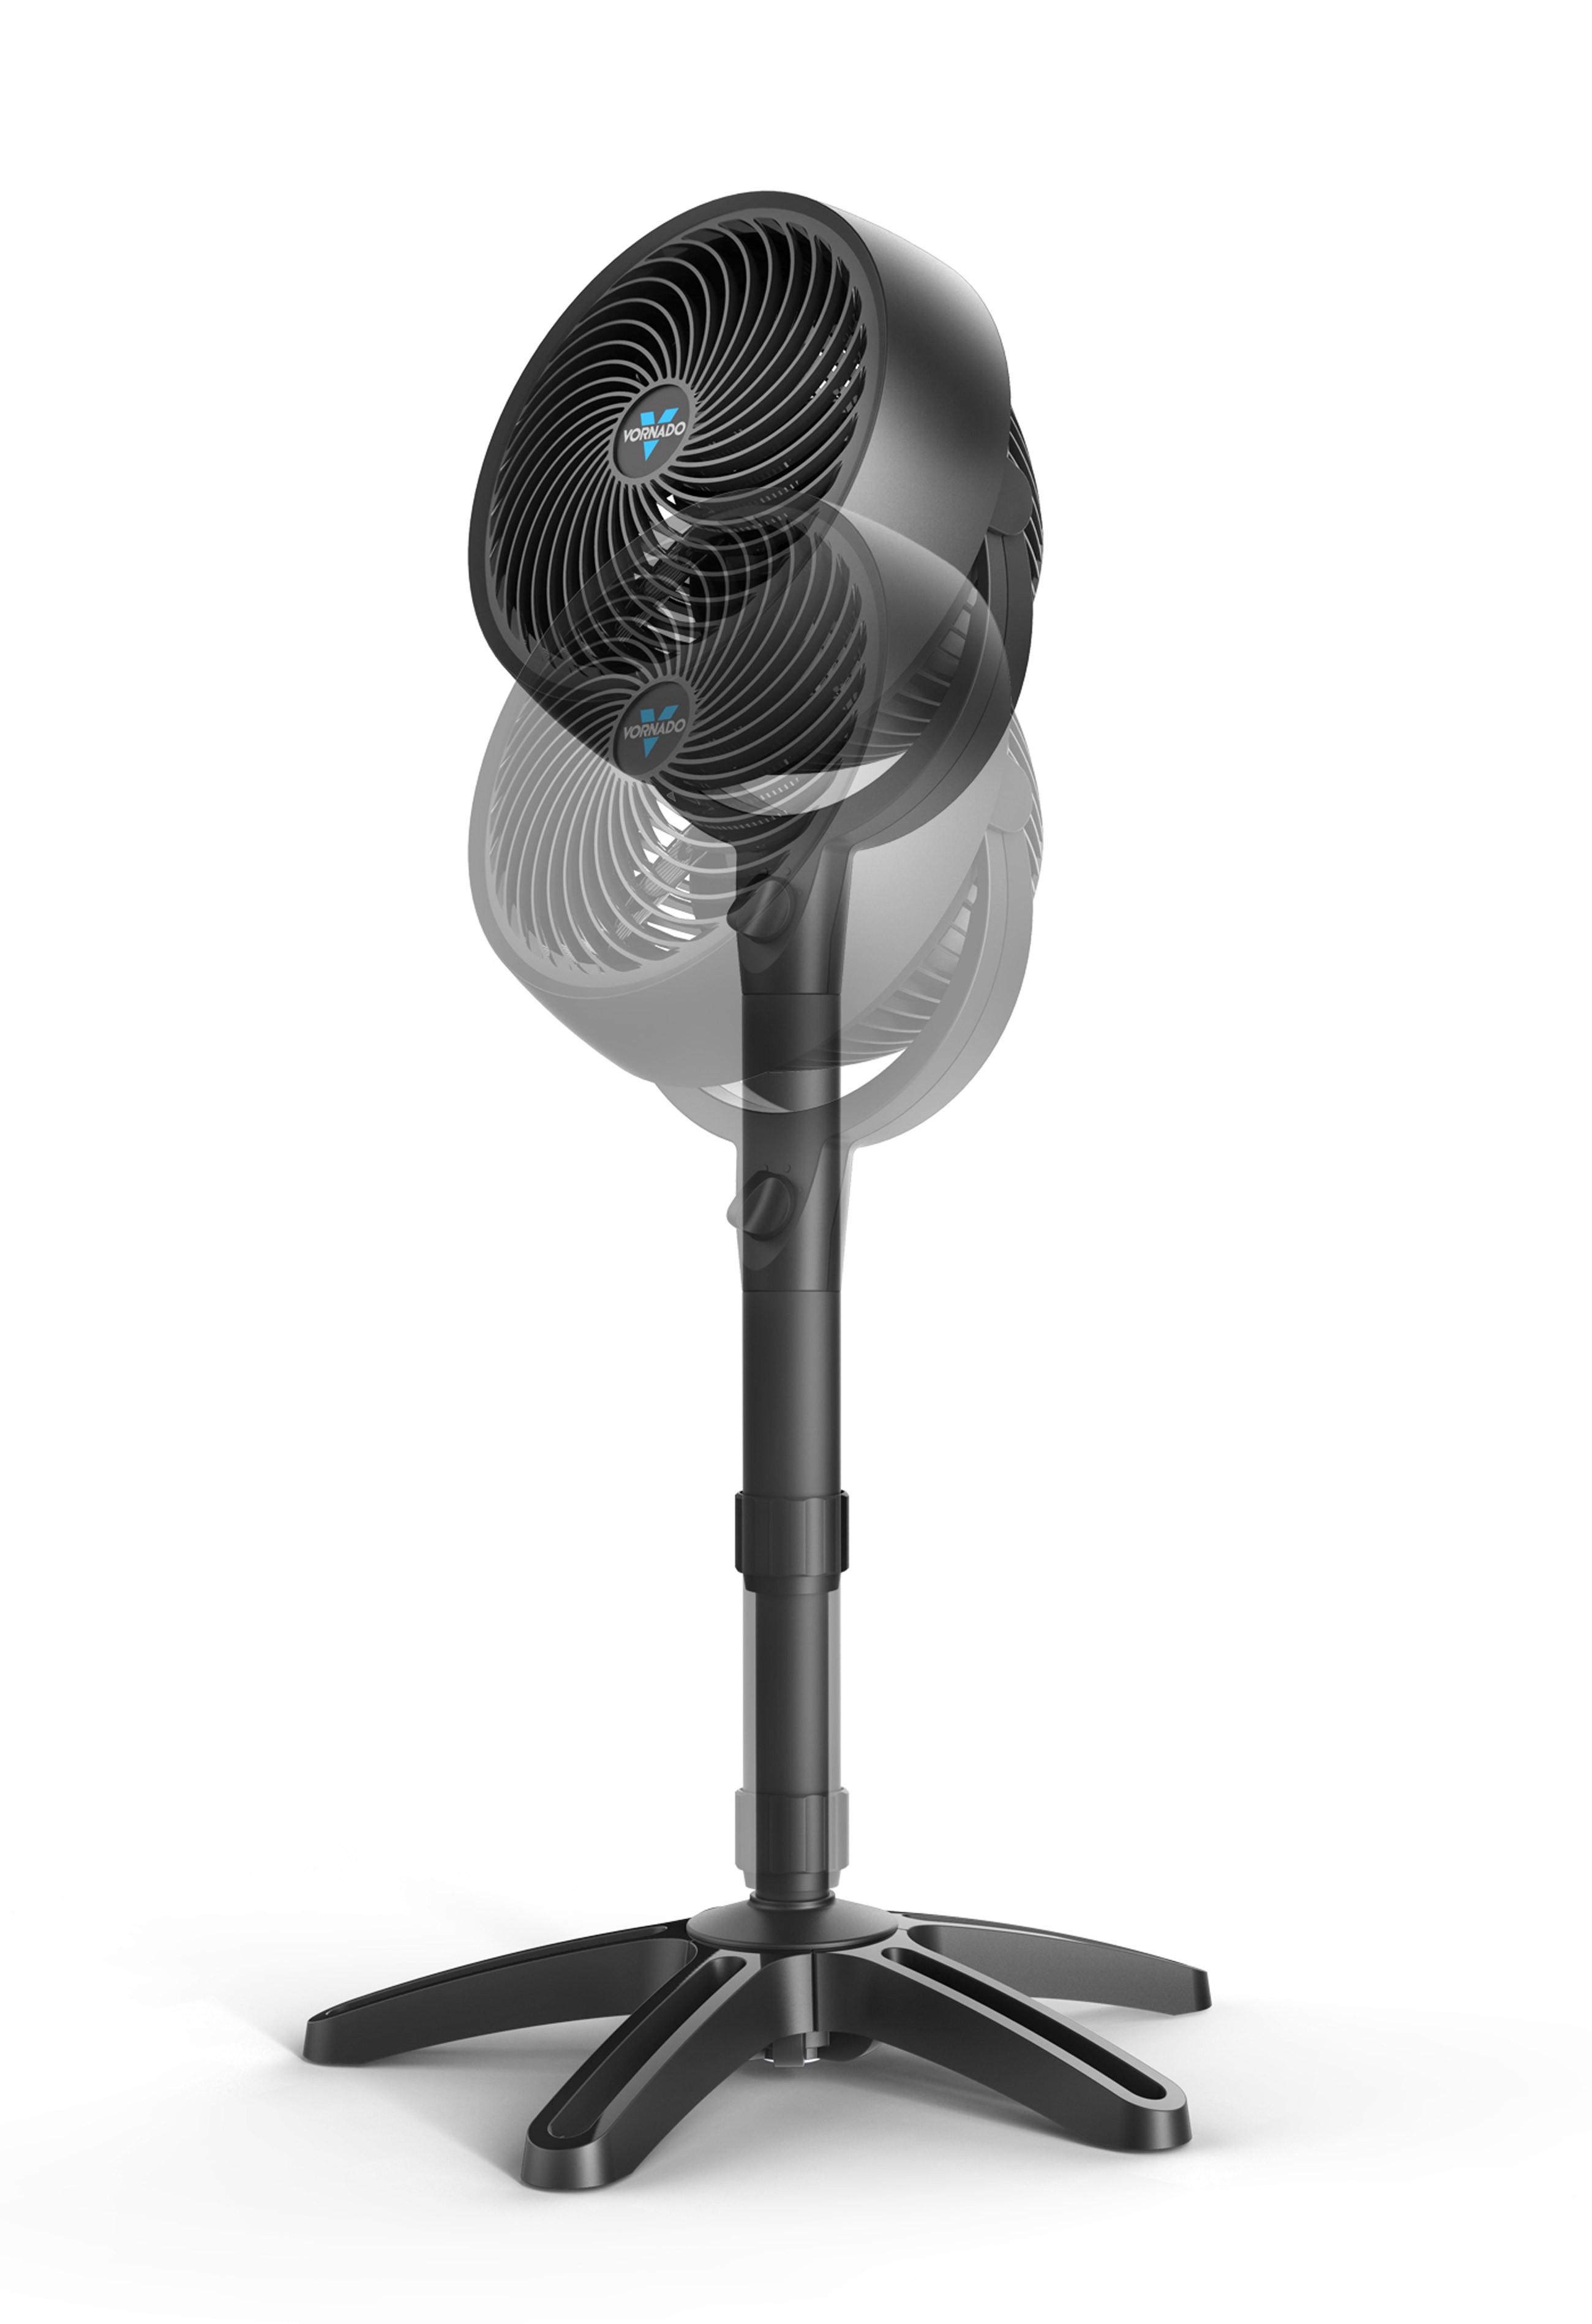 Ventilator / Raumventilator Vornado 683 höhenverstellbar Ø24cm Bild 2